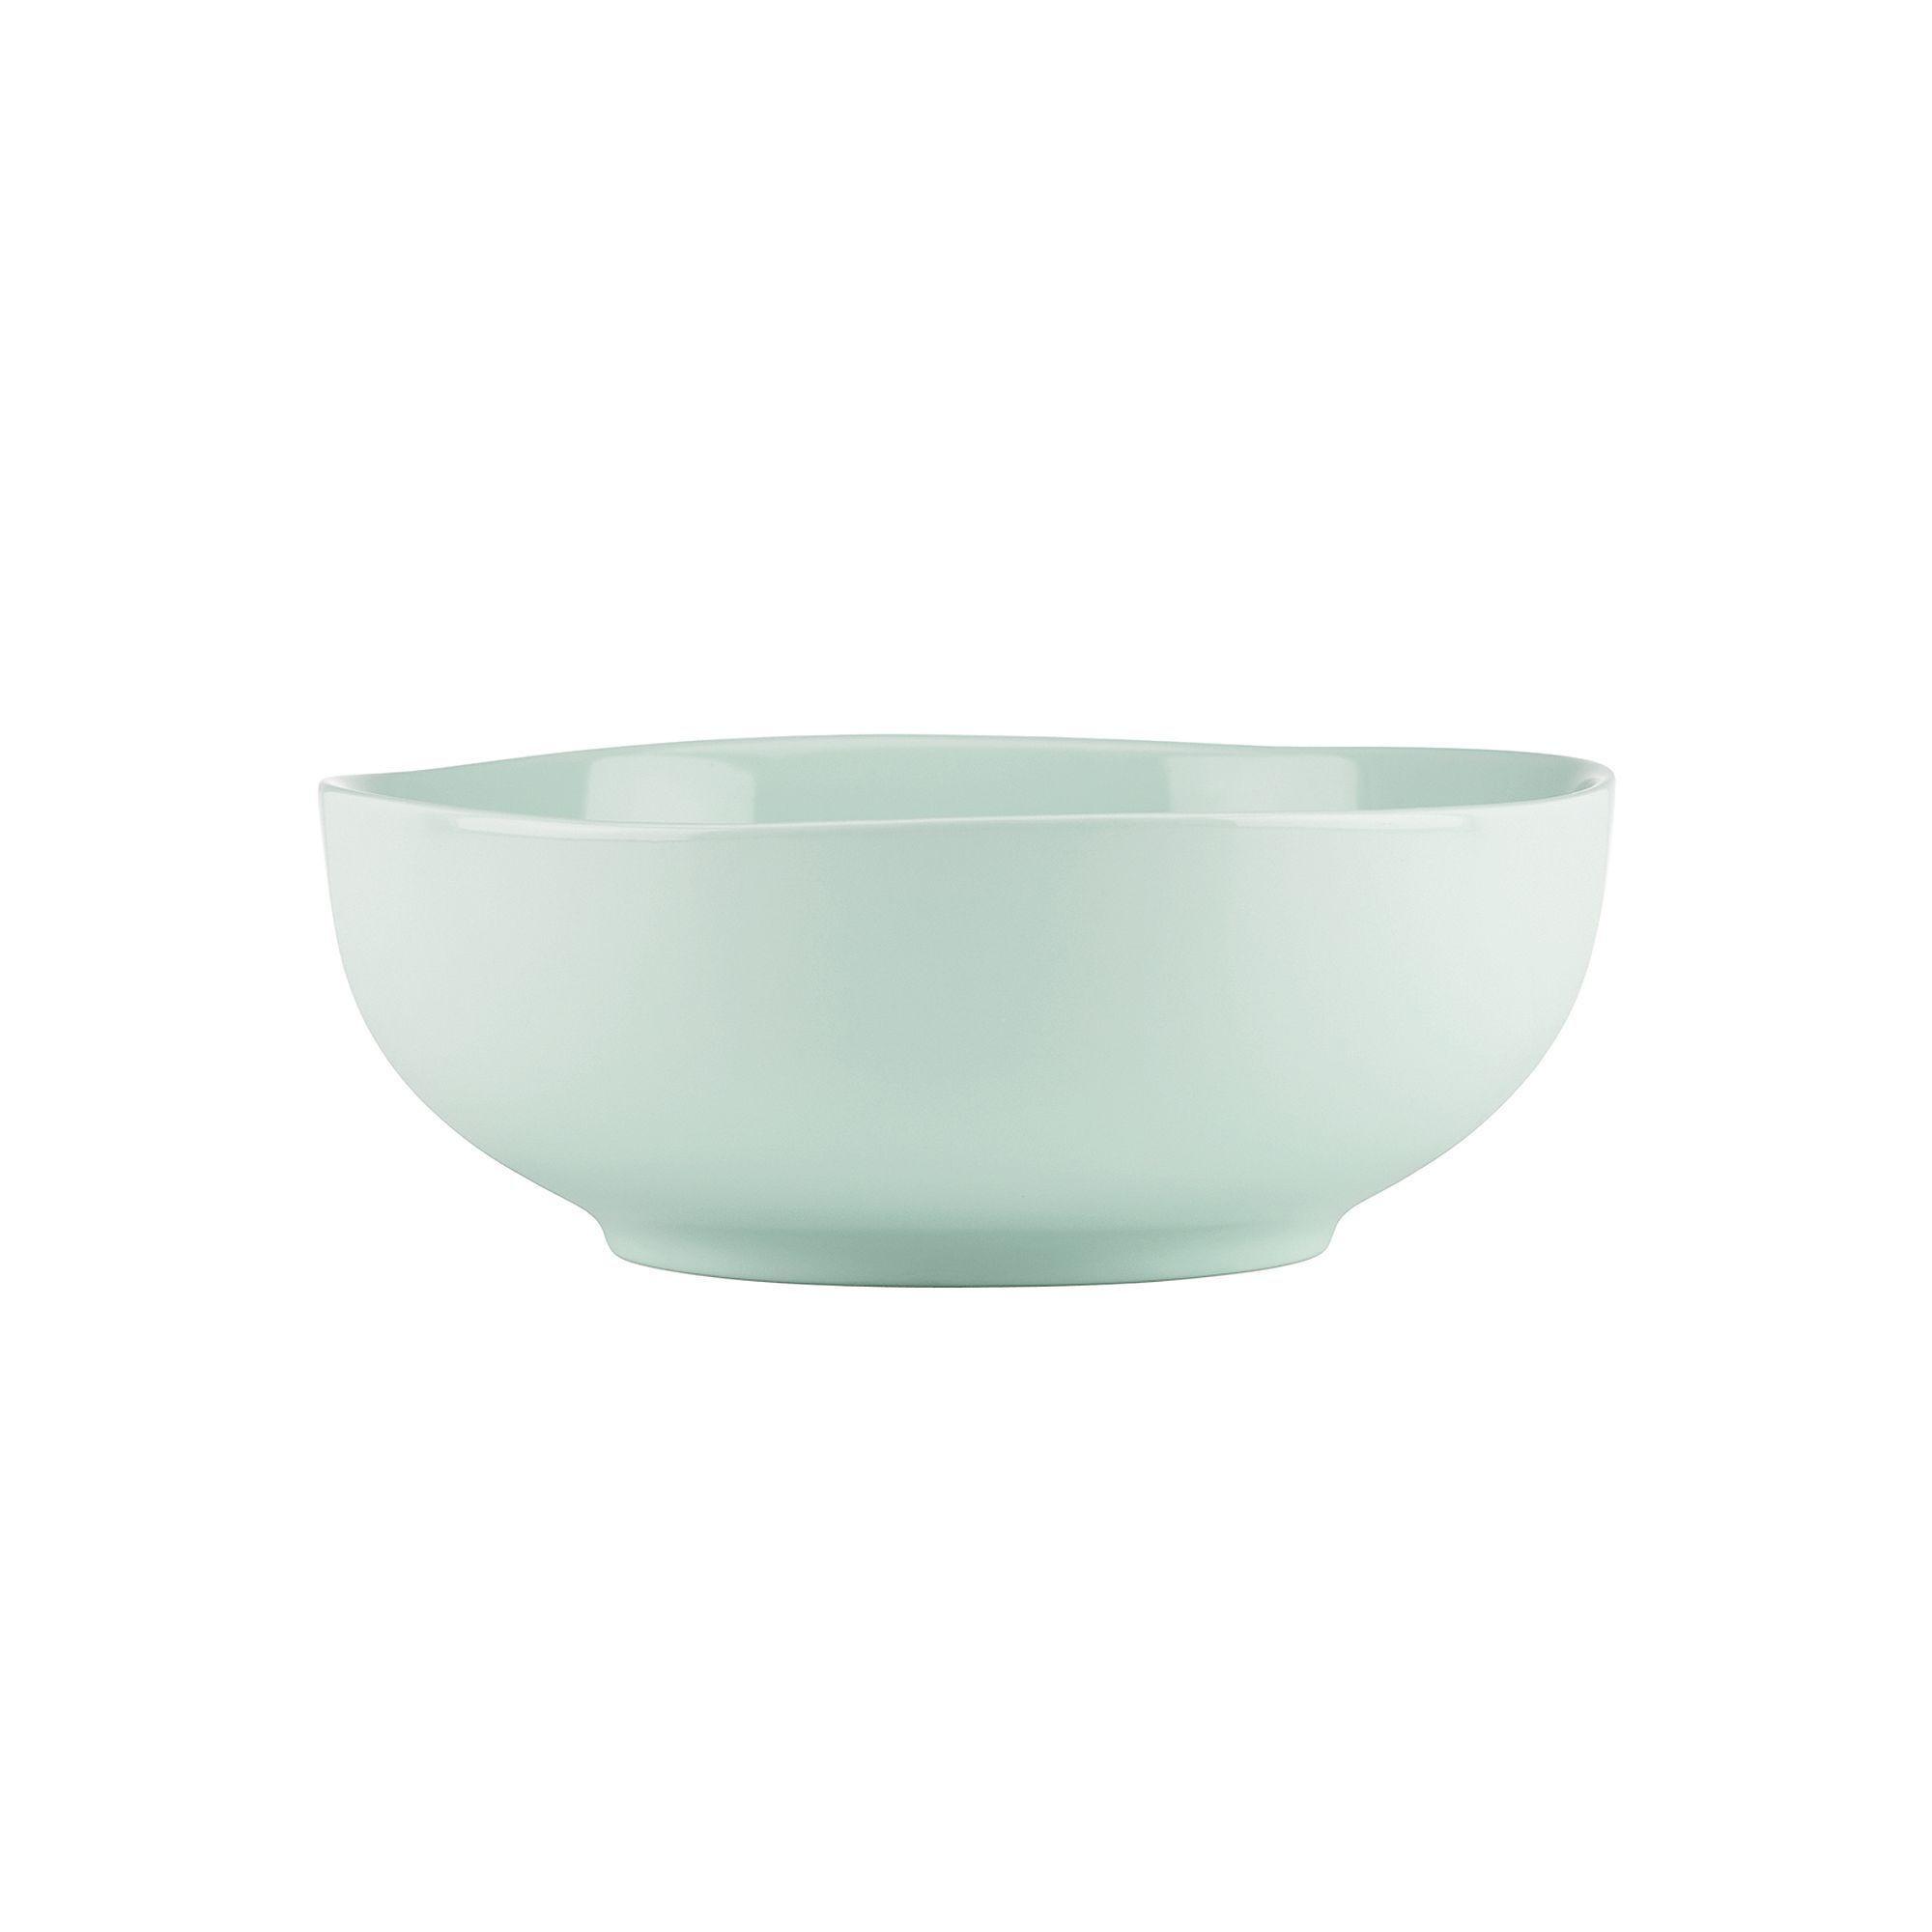 lenox crystal vase patterns of snow crystal bowl regarding lenox origins blue ice serving bowl